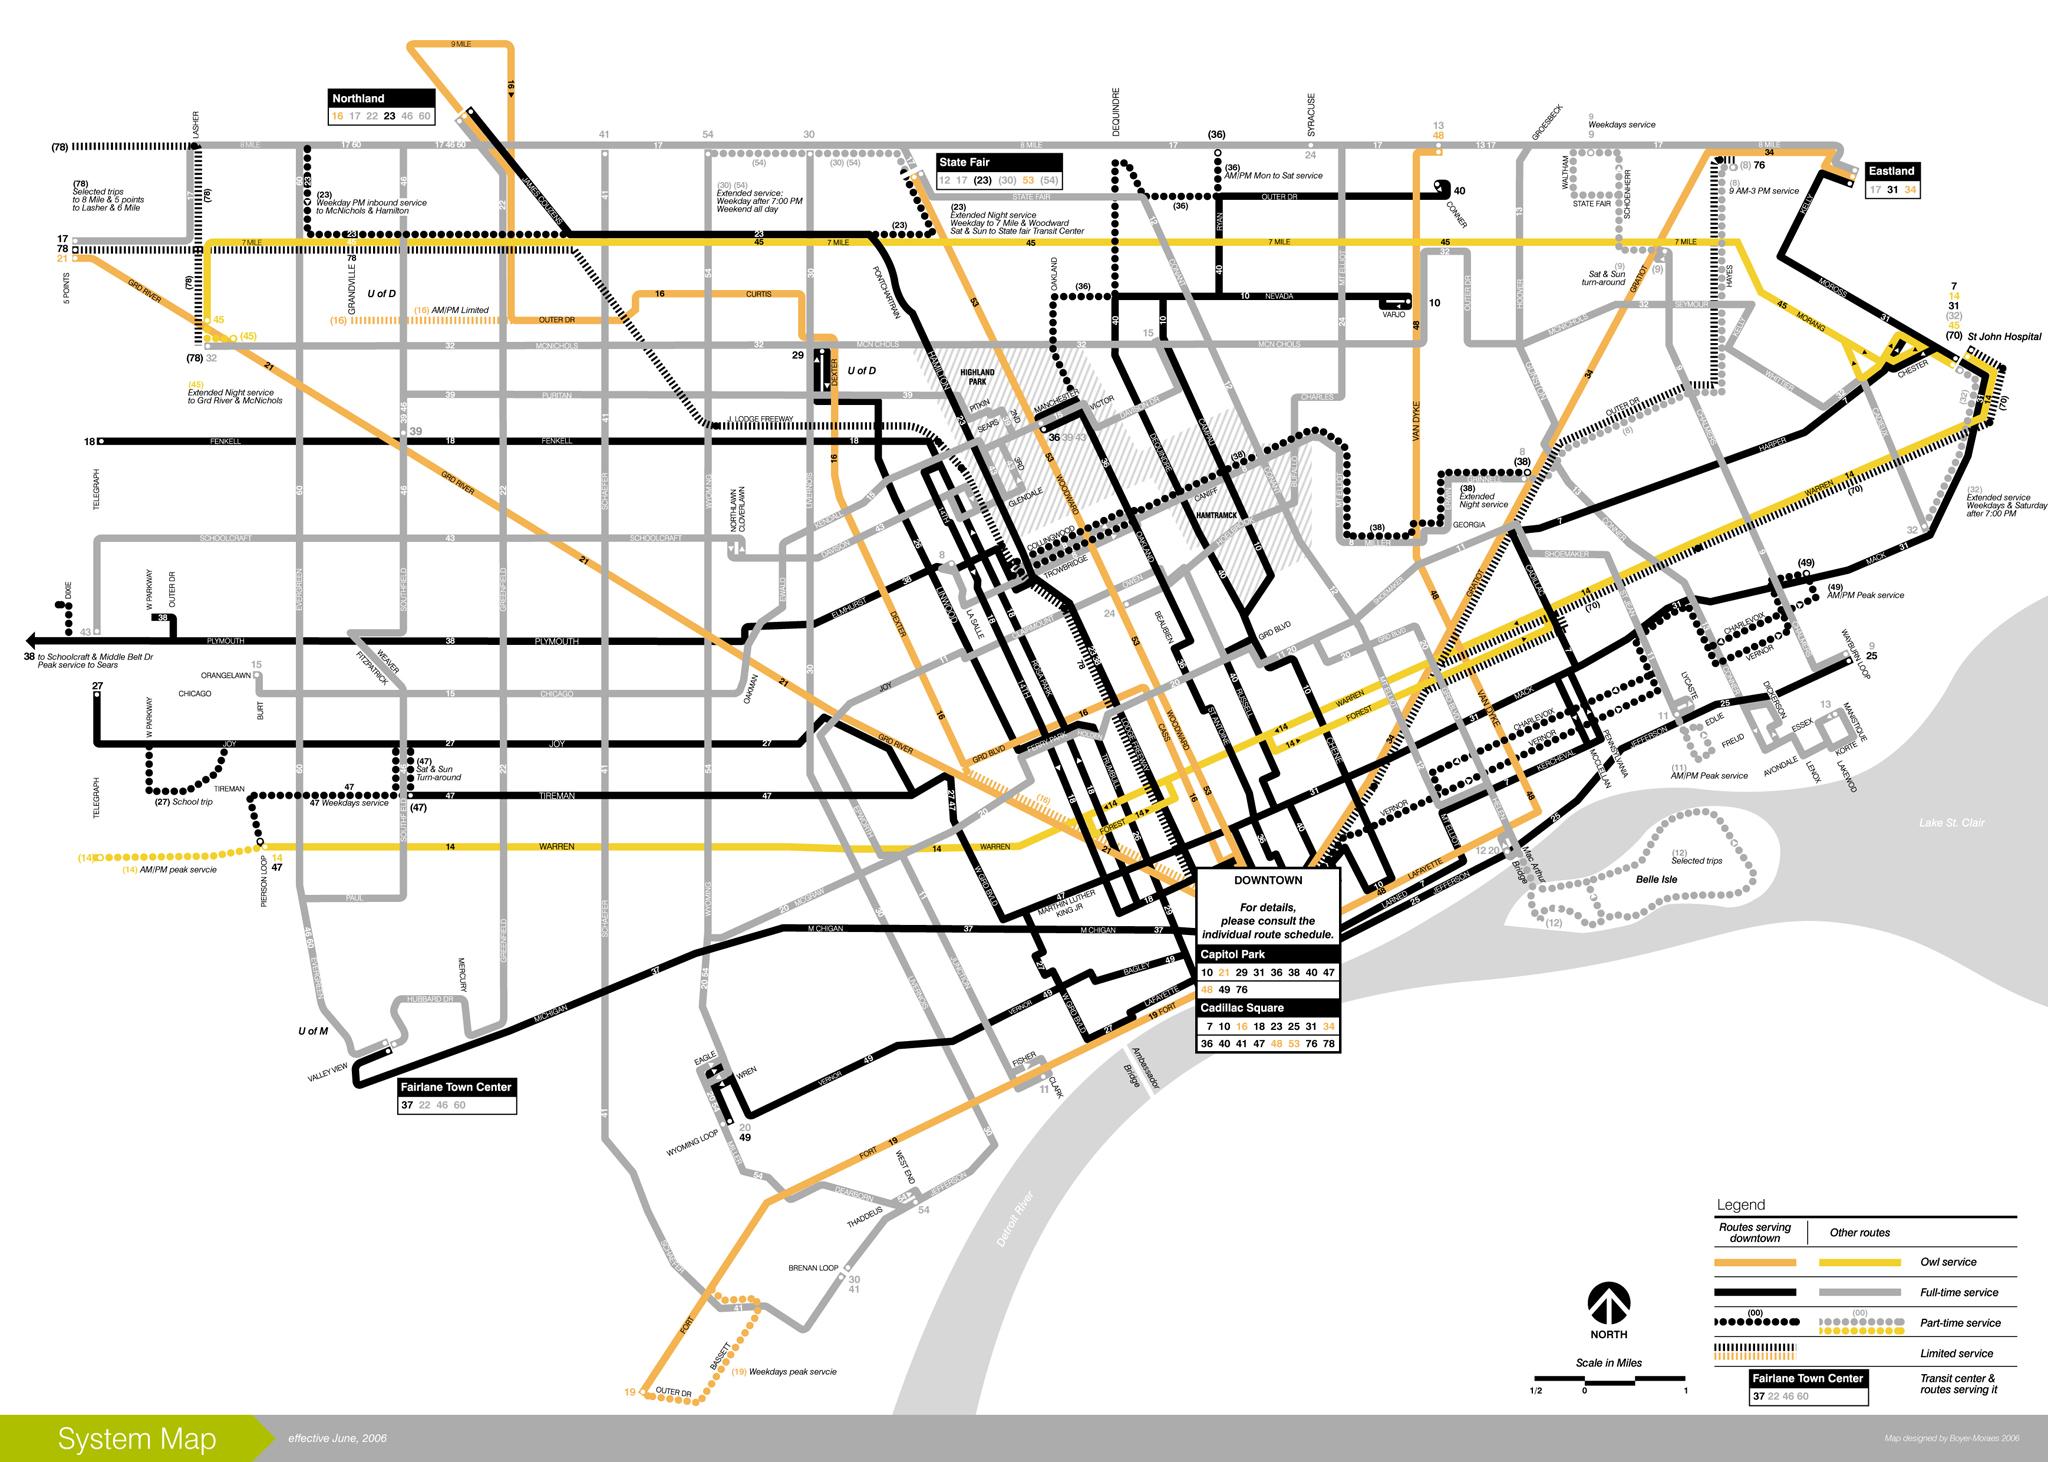 detroit street map pdf Filling In The Gaps Filling In The Gaps detroit street map pdf